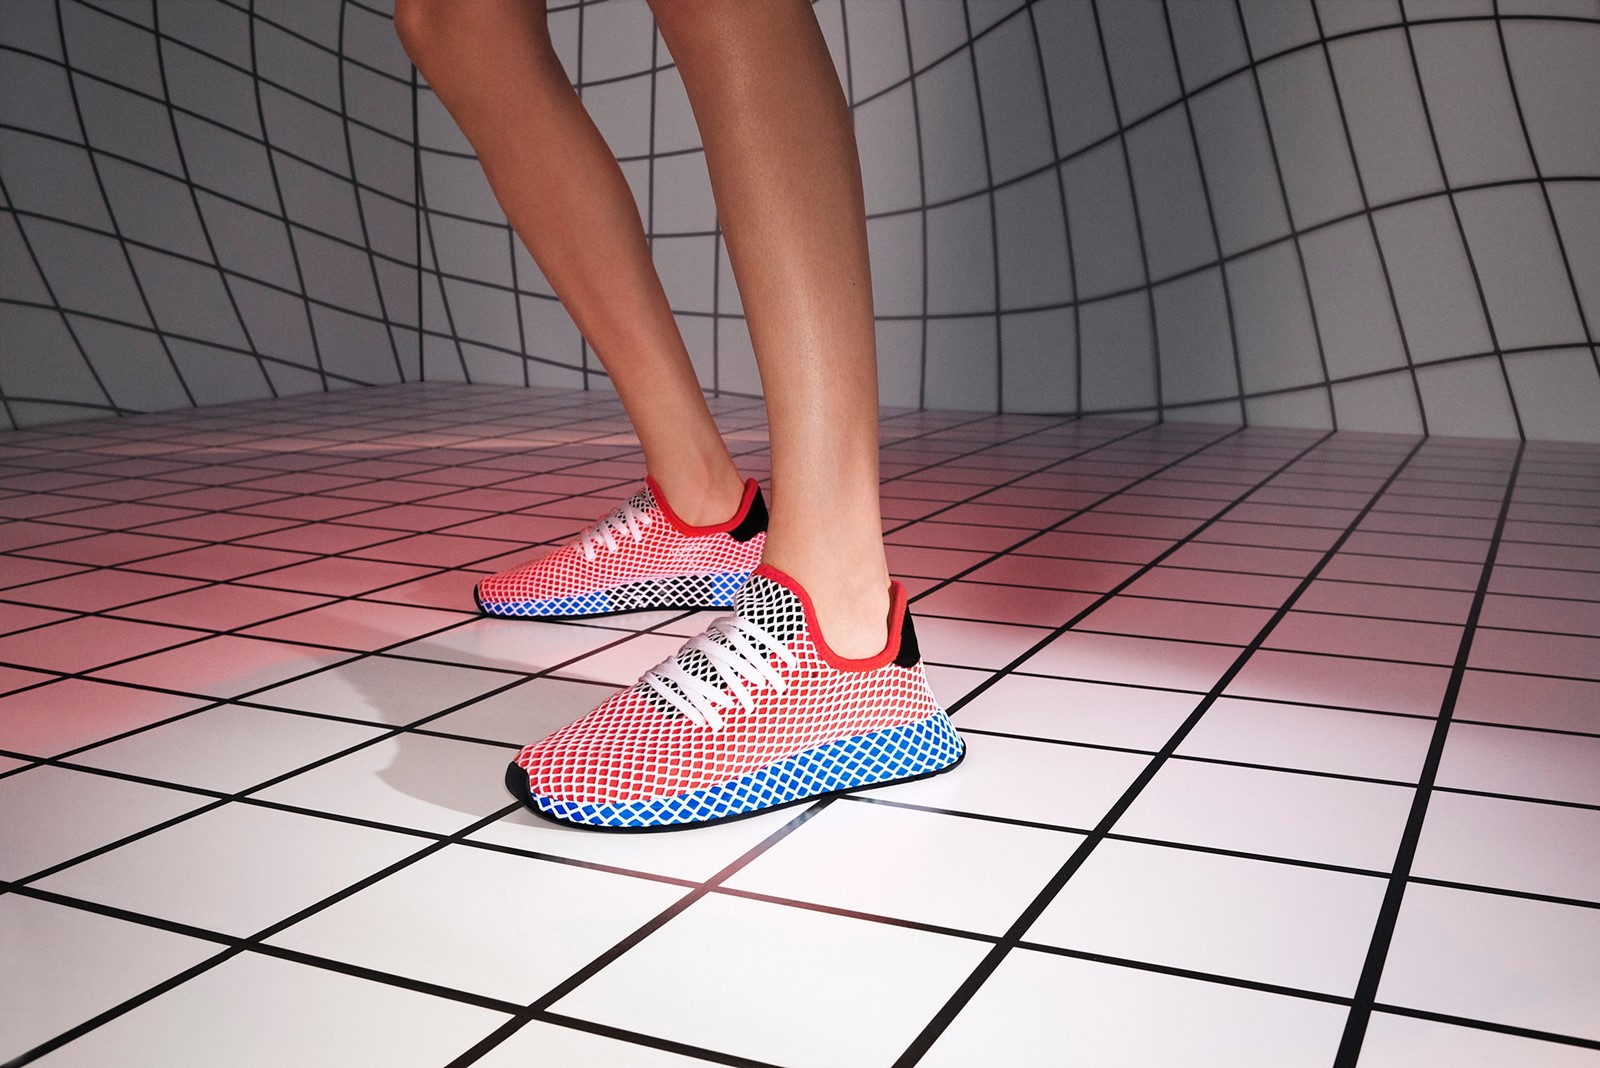 Giày thể thao Deerupt của thương hiệu Adidas Originals 3